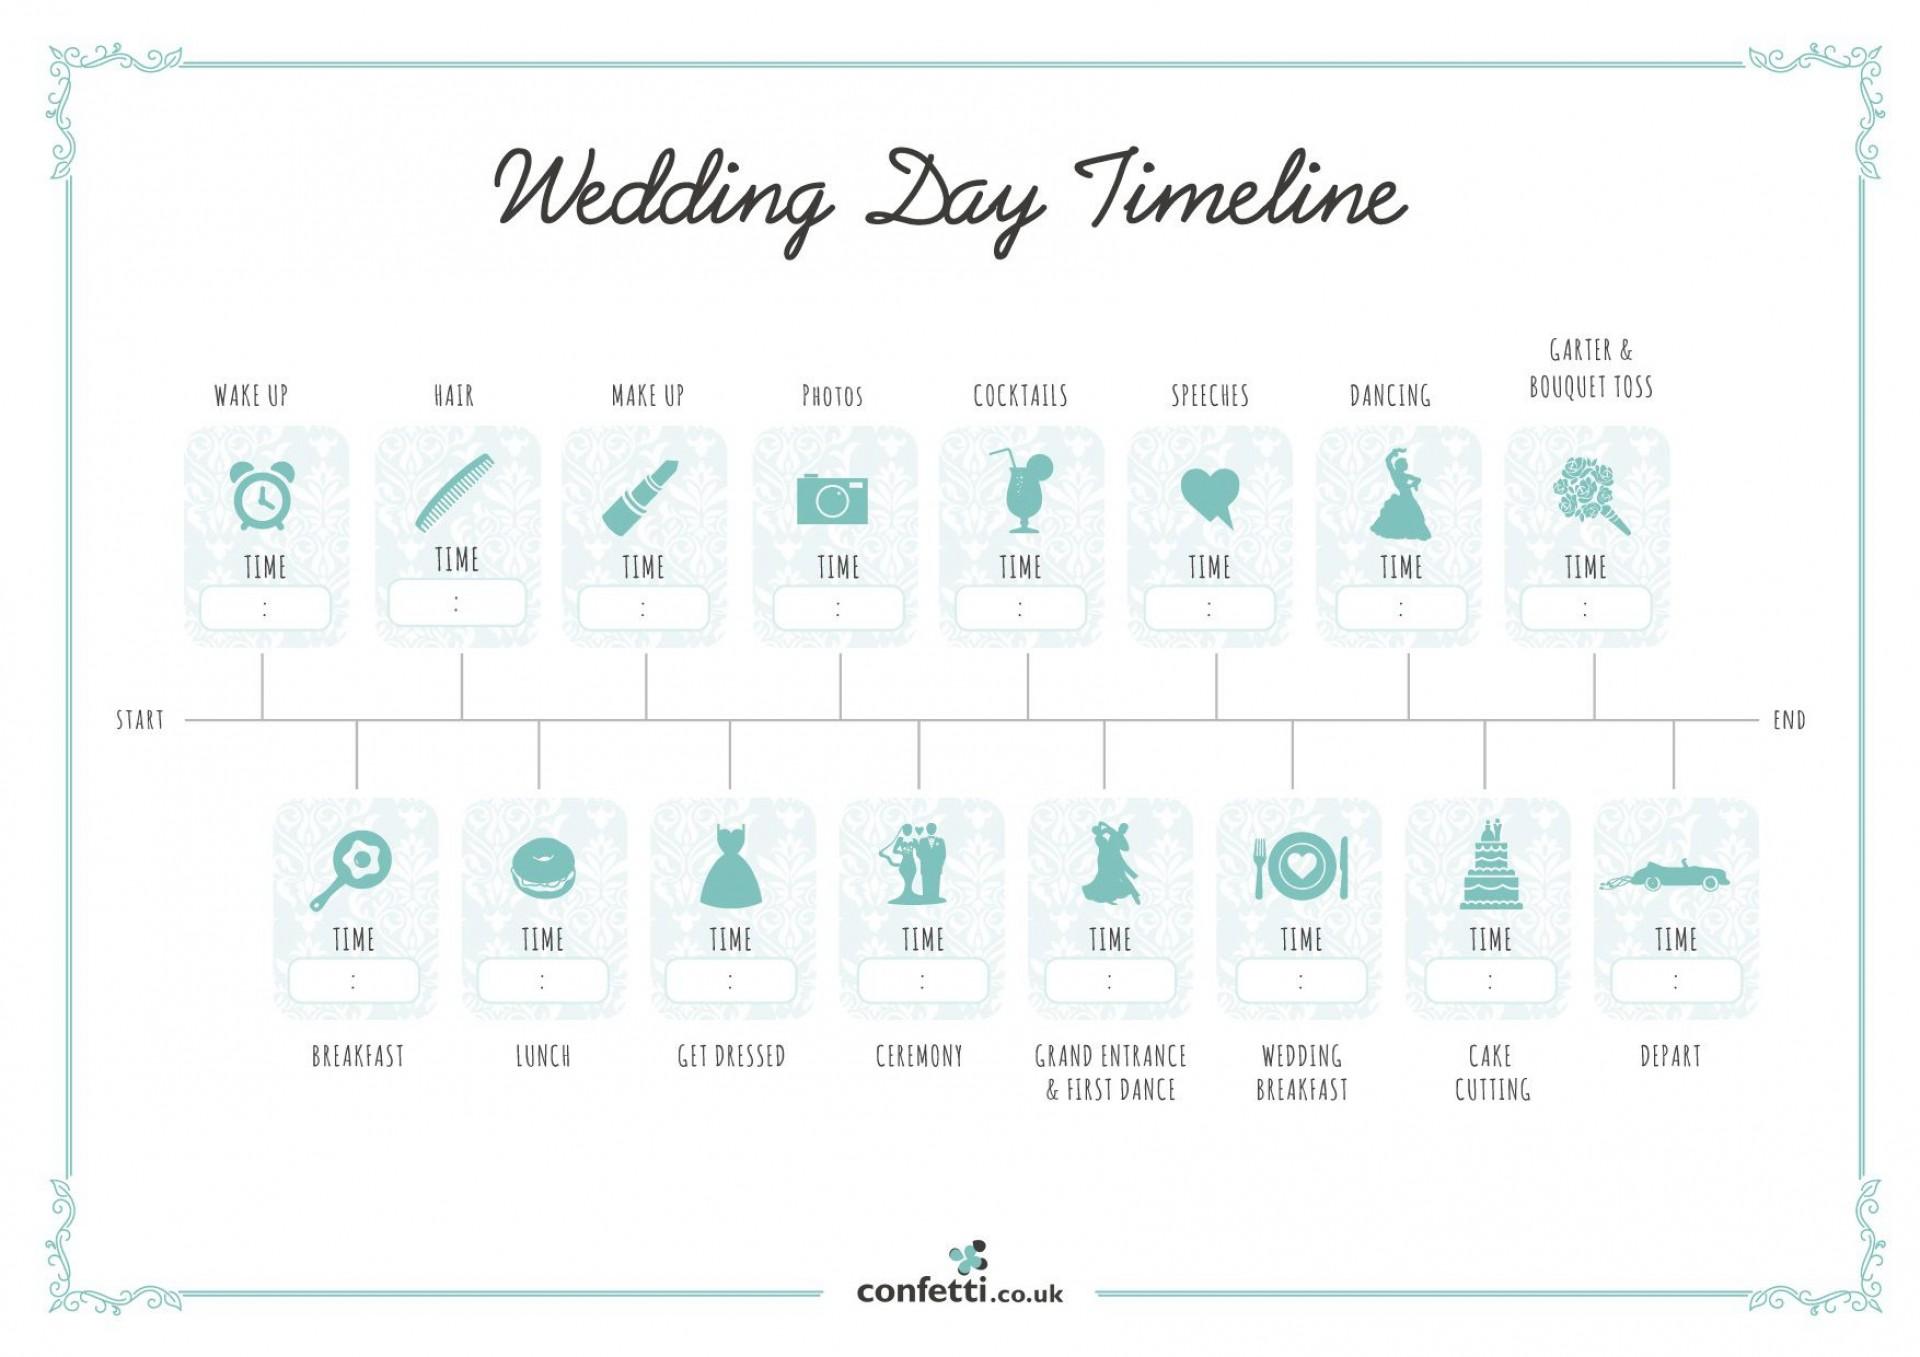 007 Unusual Wedding Timeline Template Free High Resolution  Day Excel Program1920